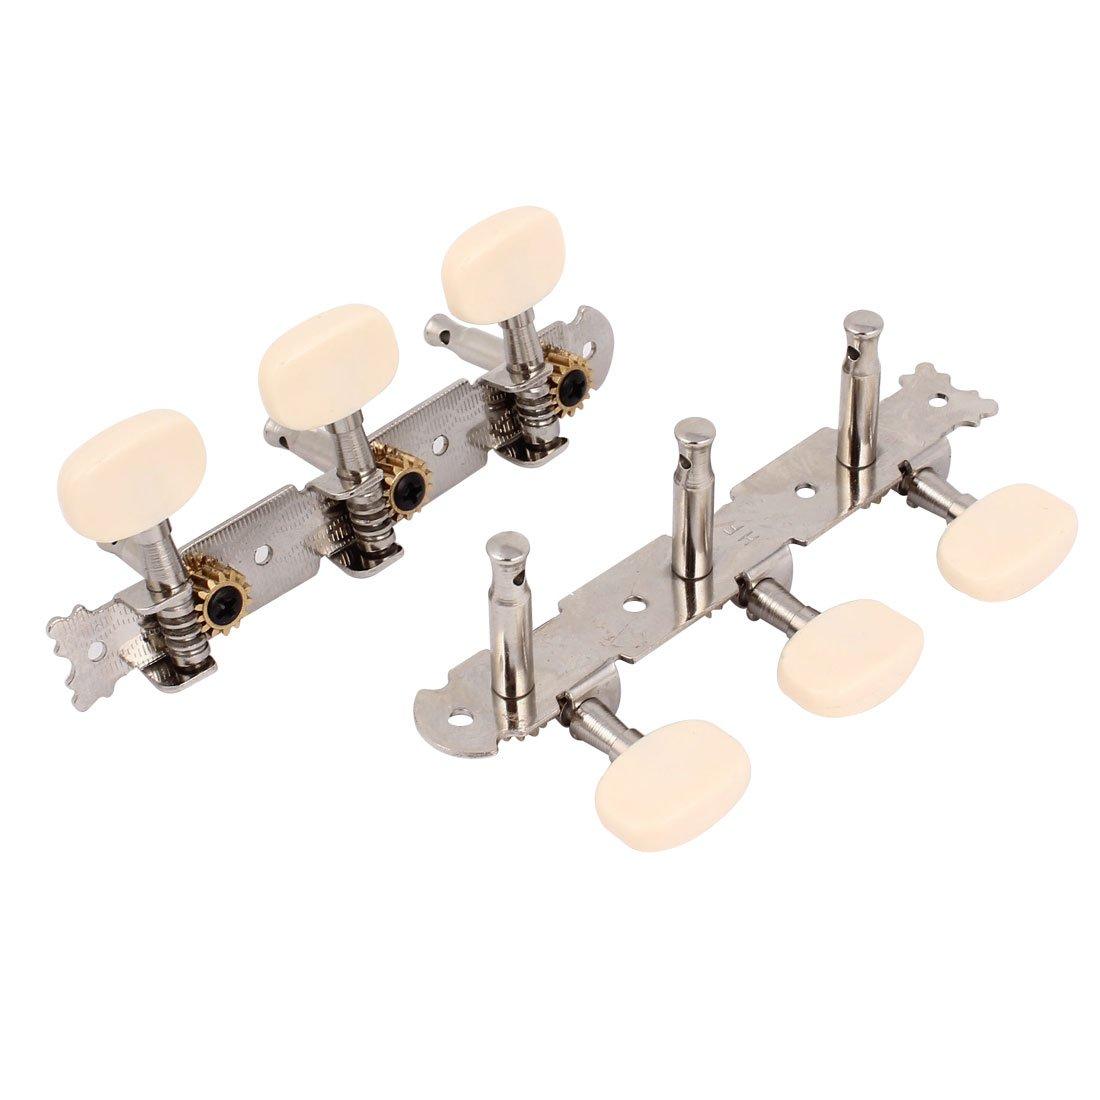 Machine Head Guitar Tuner Tuning Keys Pegs 2pcs Silver Tone Beige uxcell a14122500ux0128